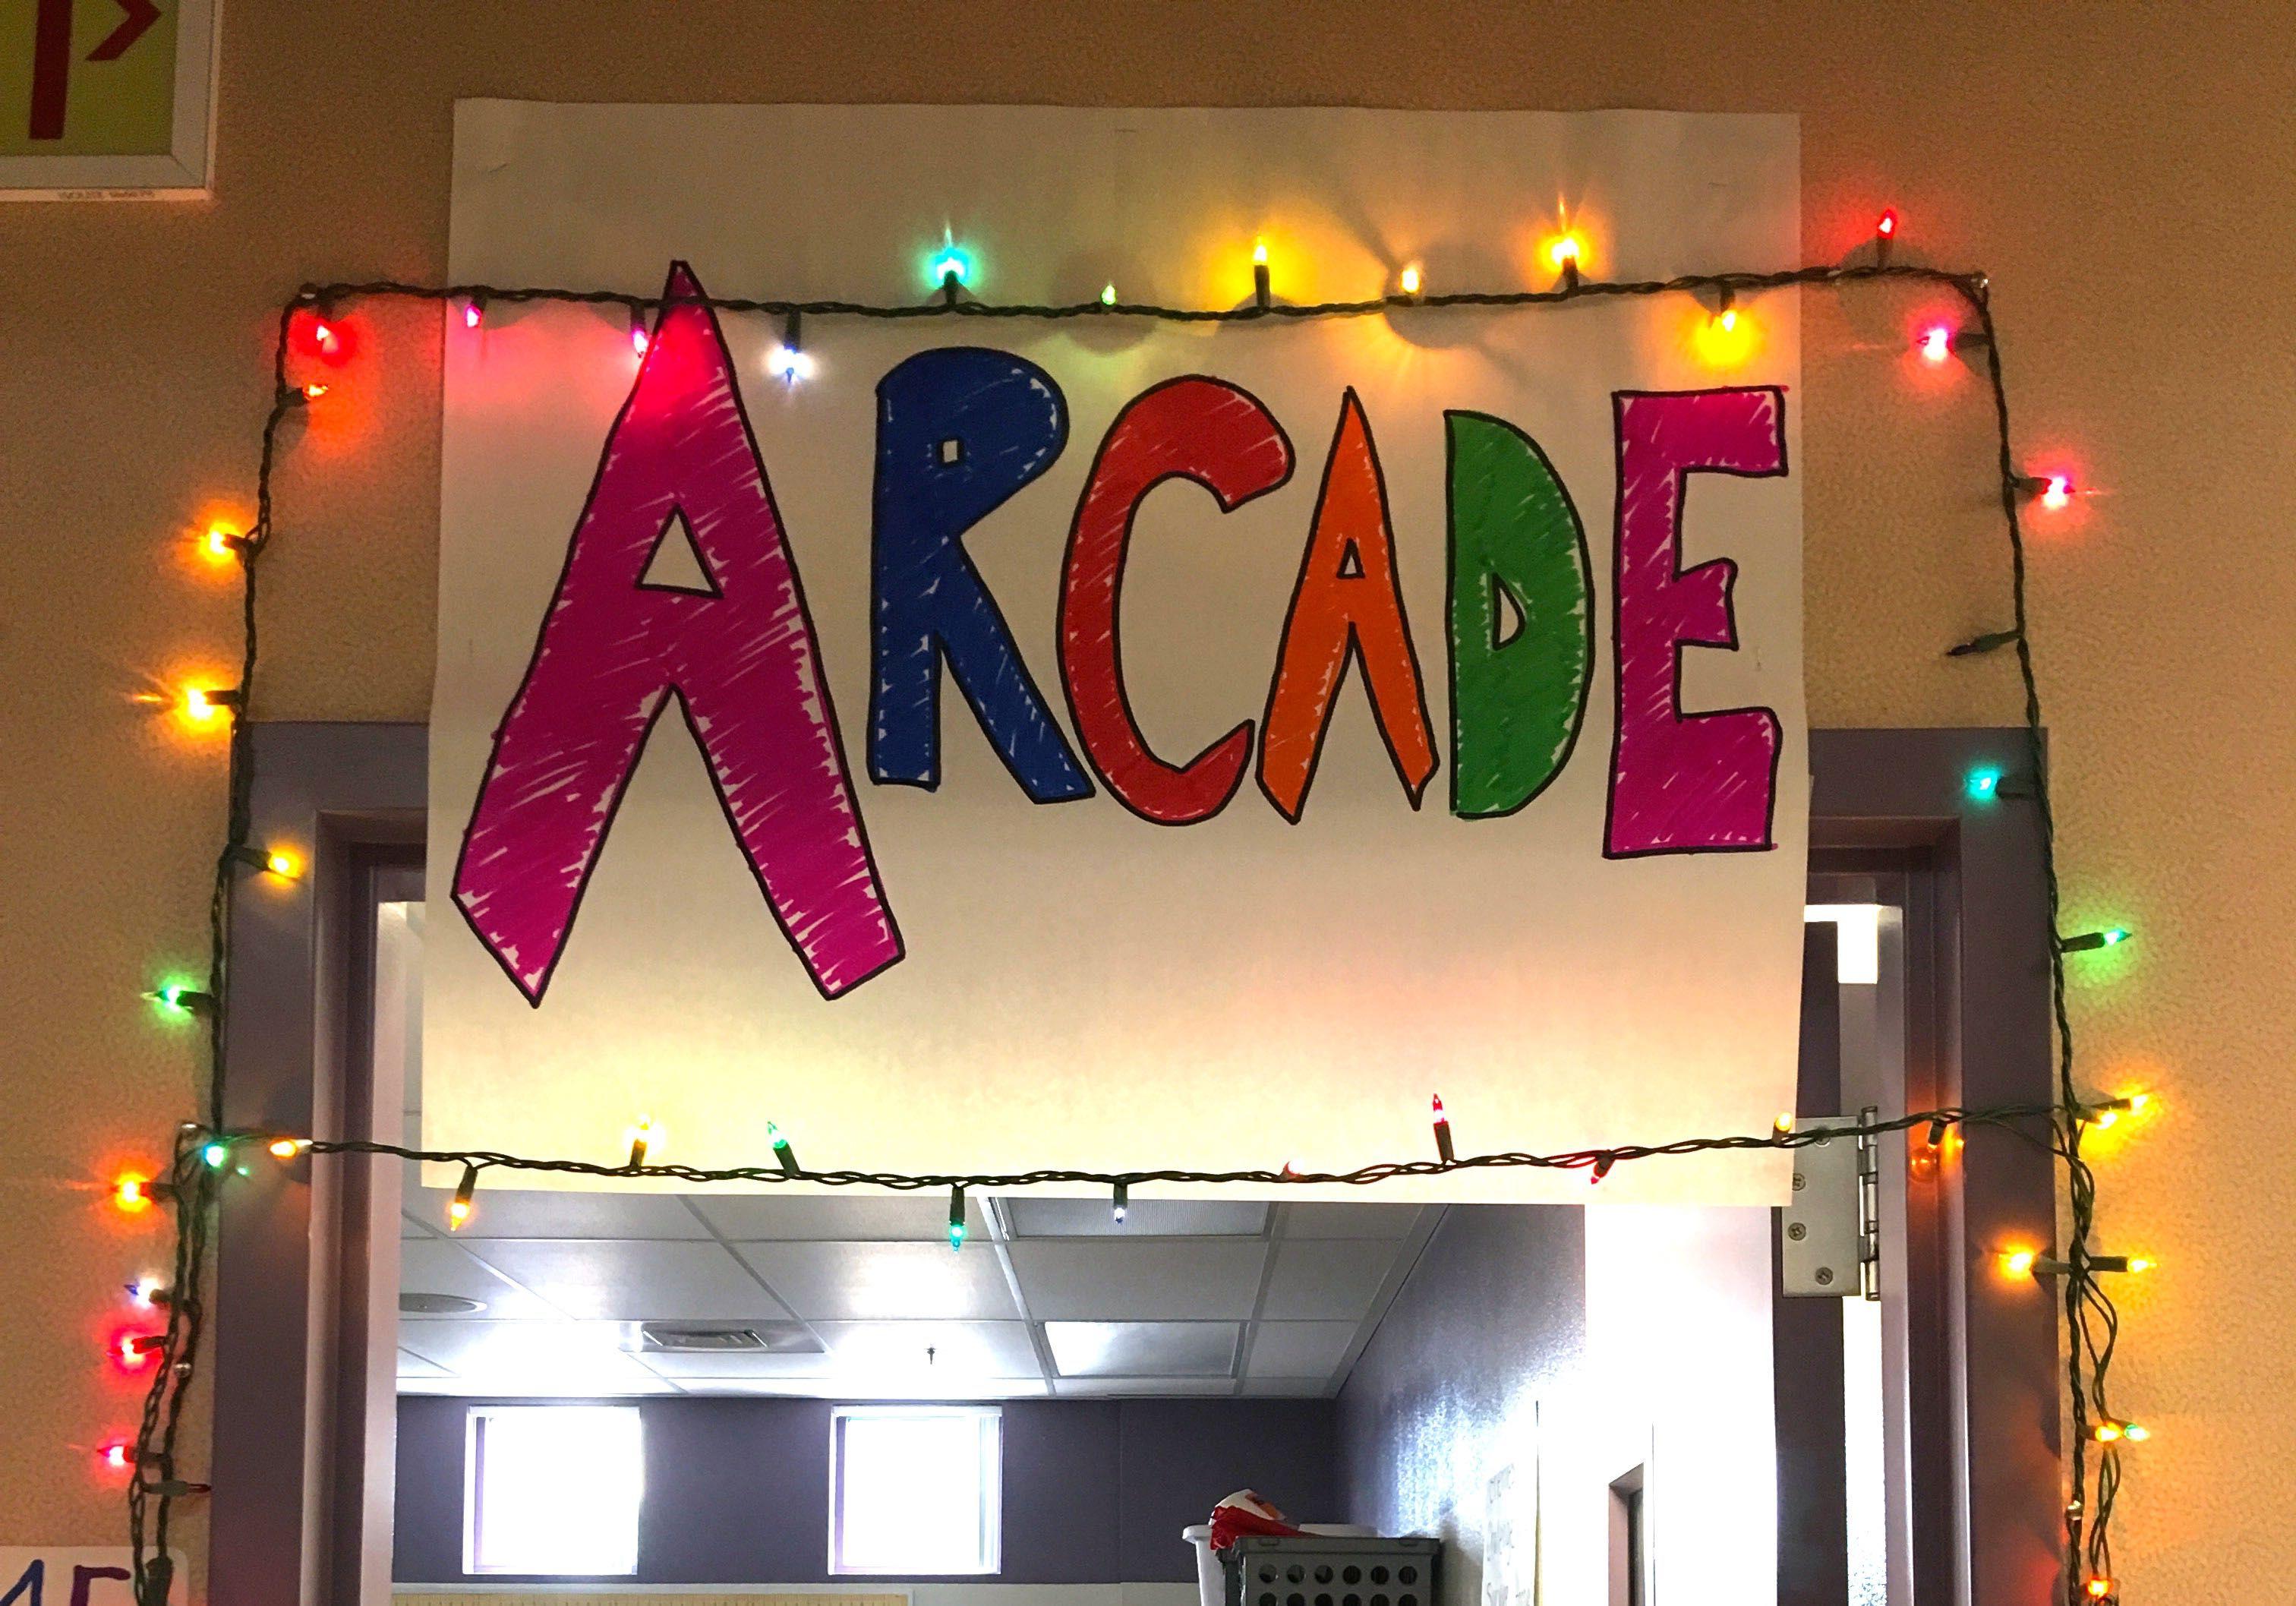 Studentrun arcade showcases video game designs and